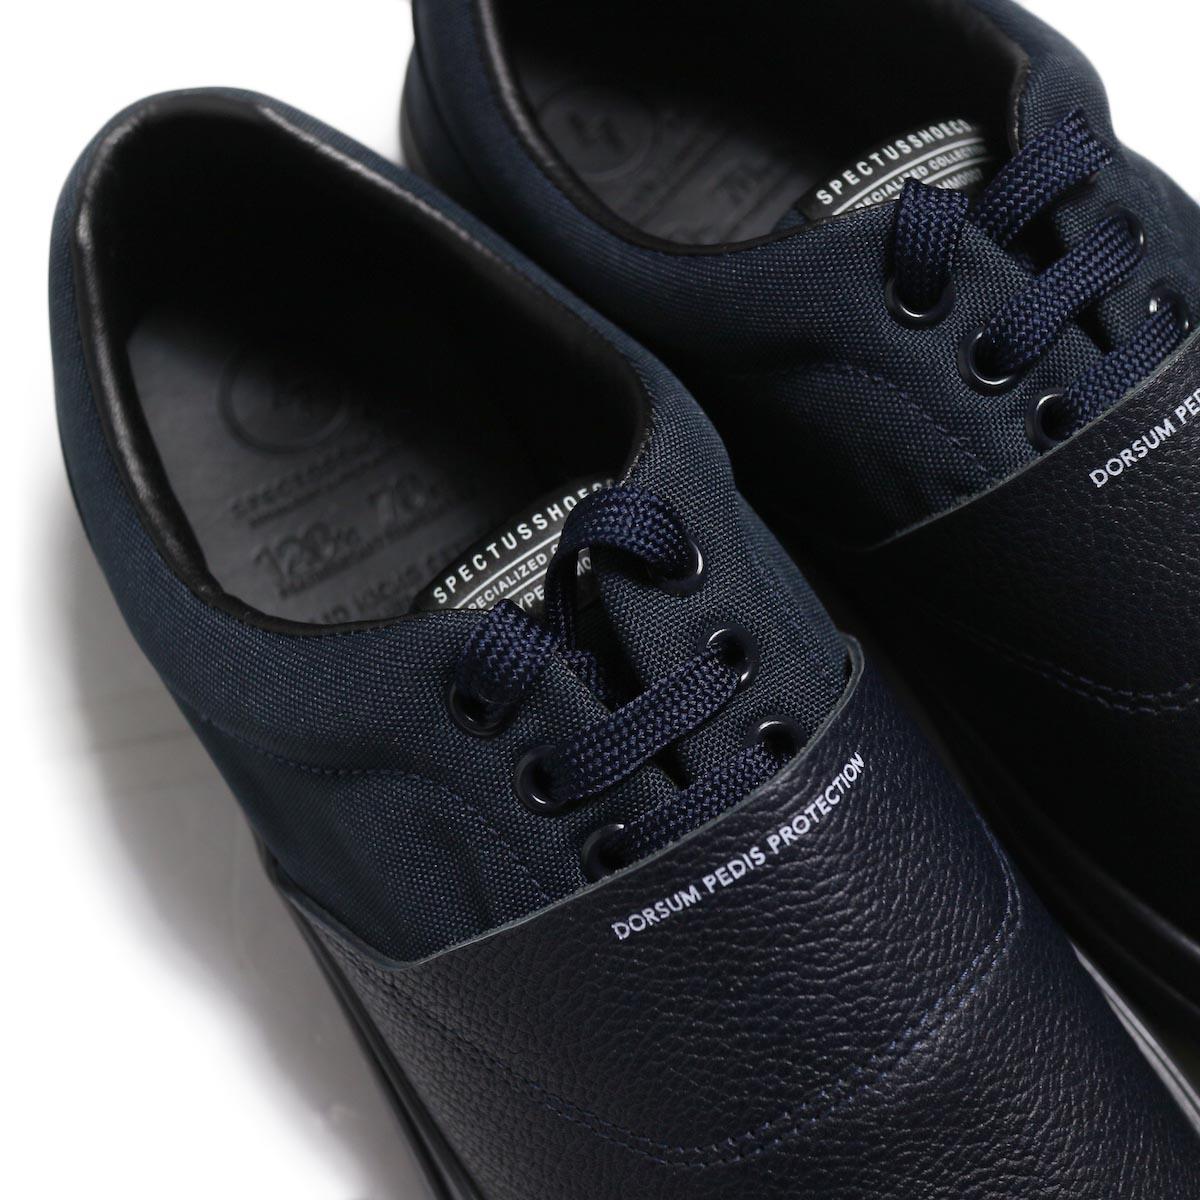 SPECTUSSHOECO. / Solid Kicks 07 -Navy(SSC1912004) アッパー